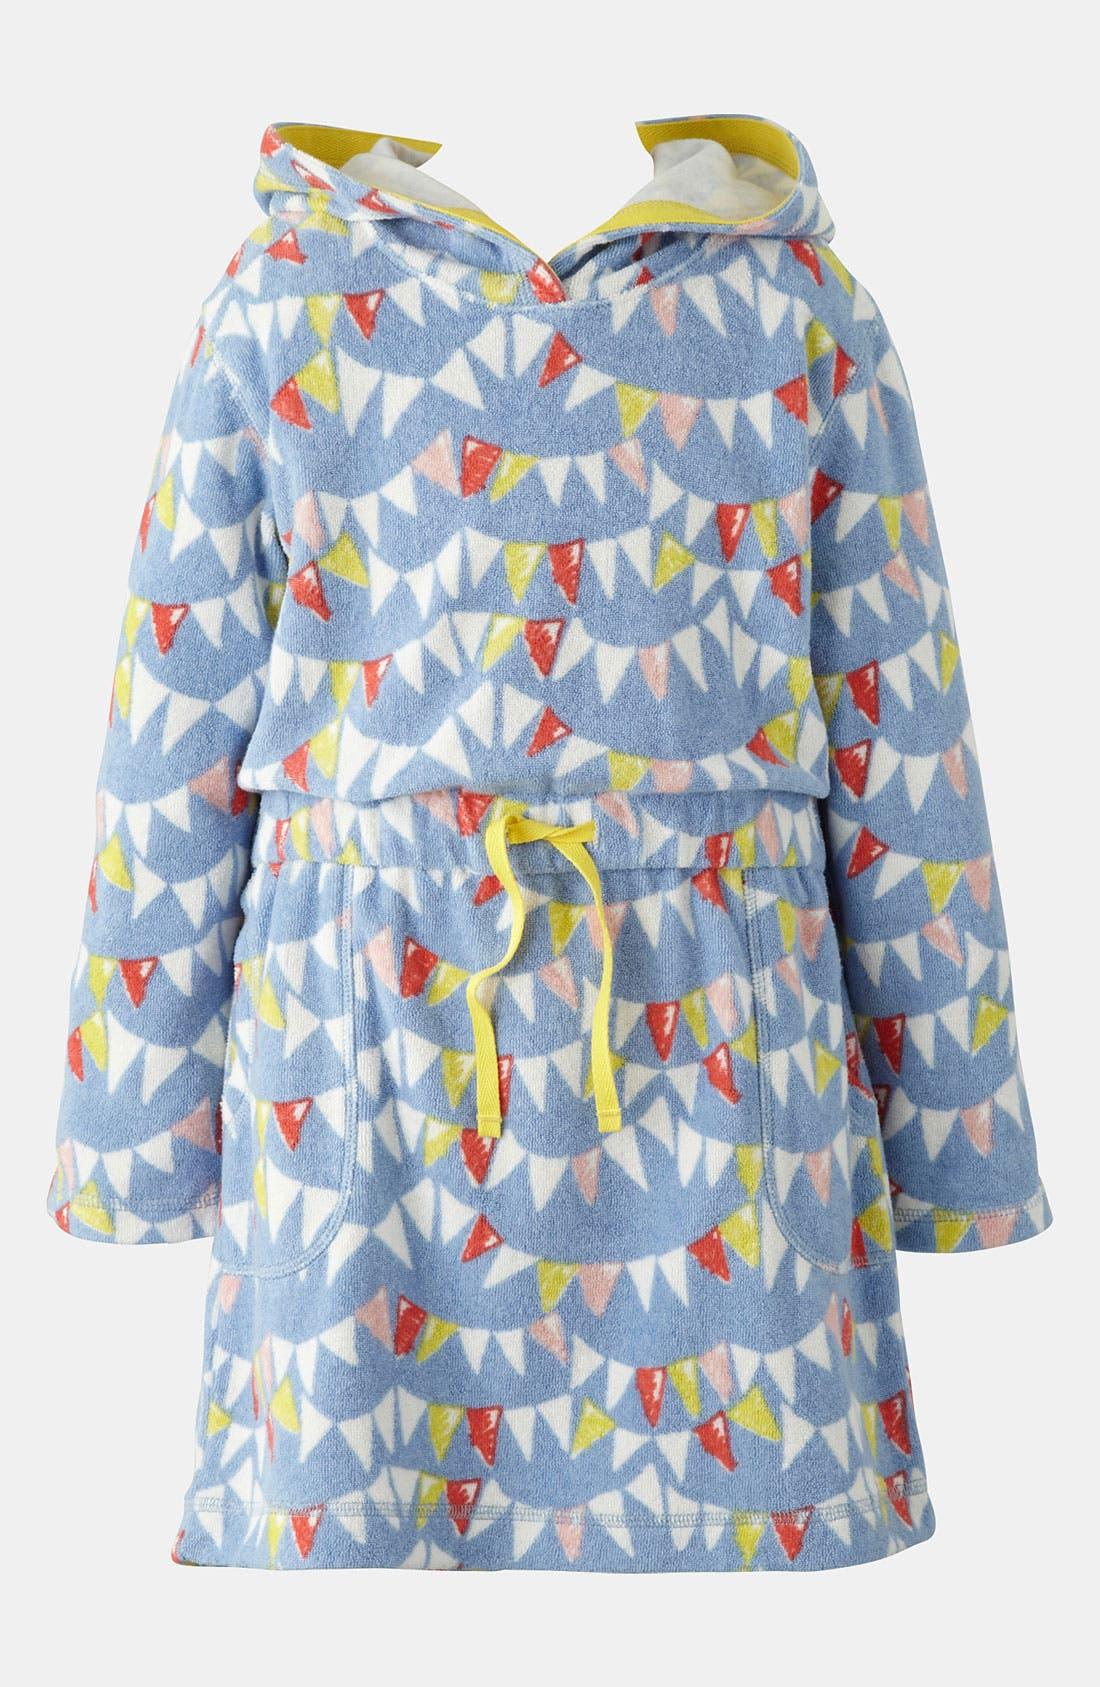 Main Image - Mini Boden Beach Dress (Toddler)